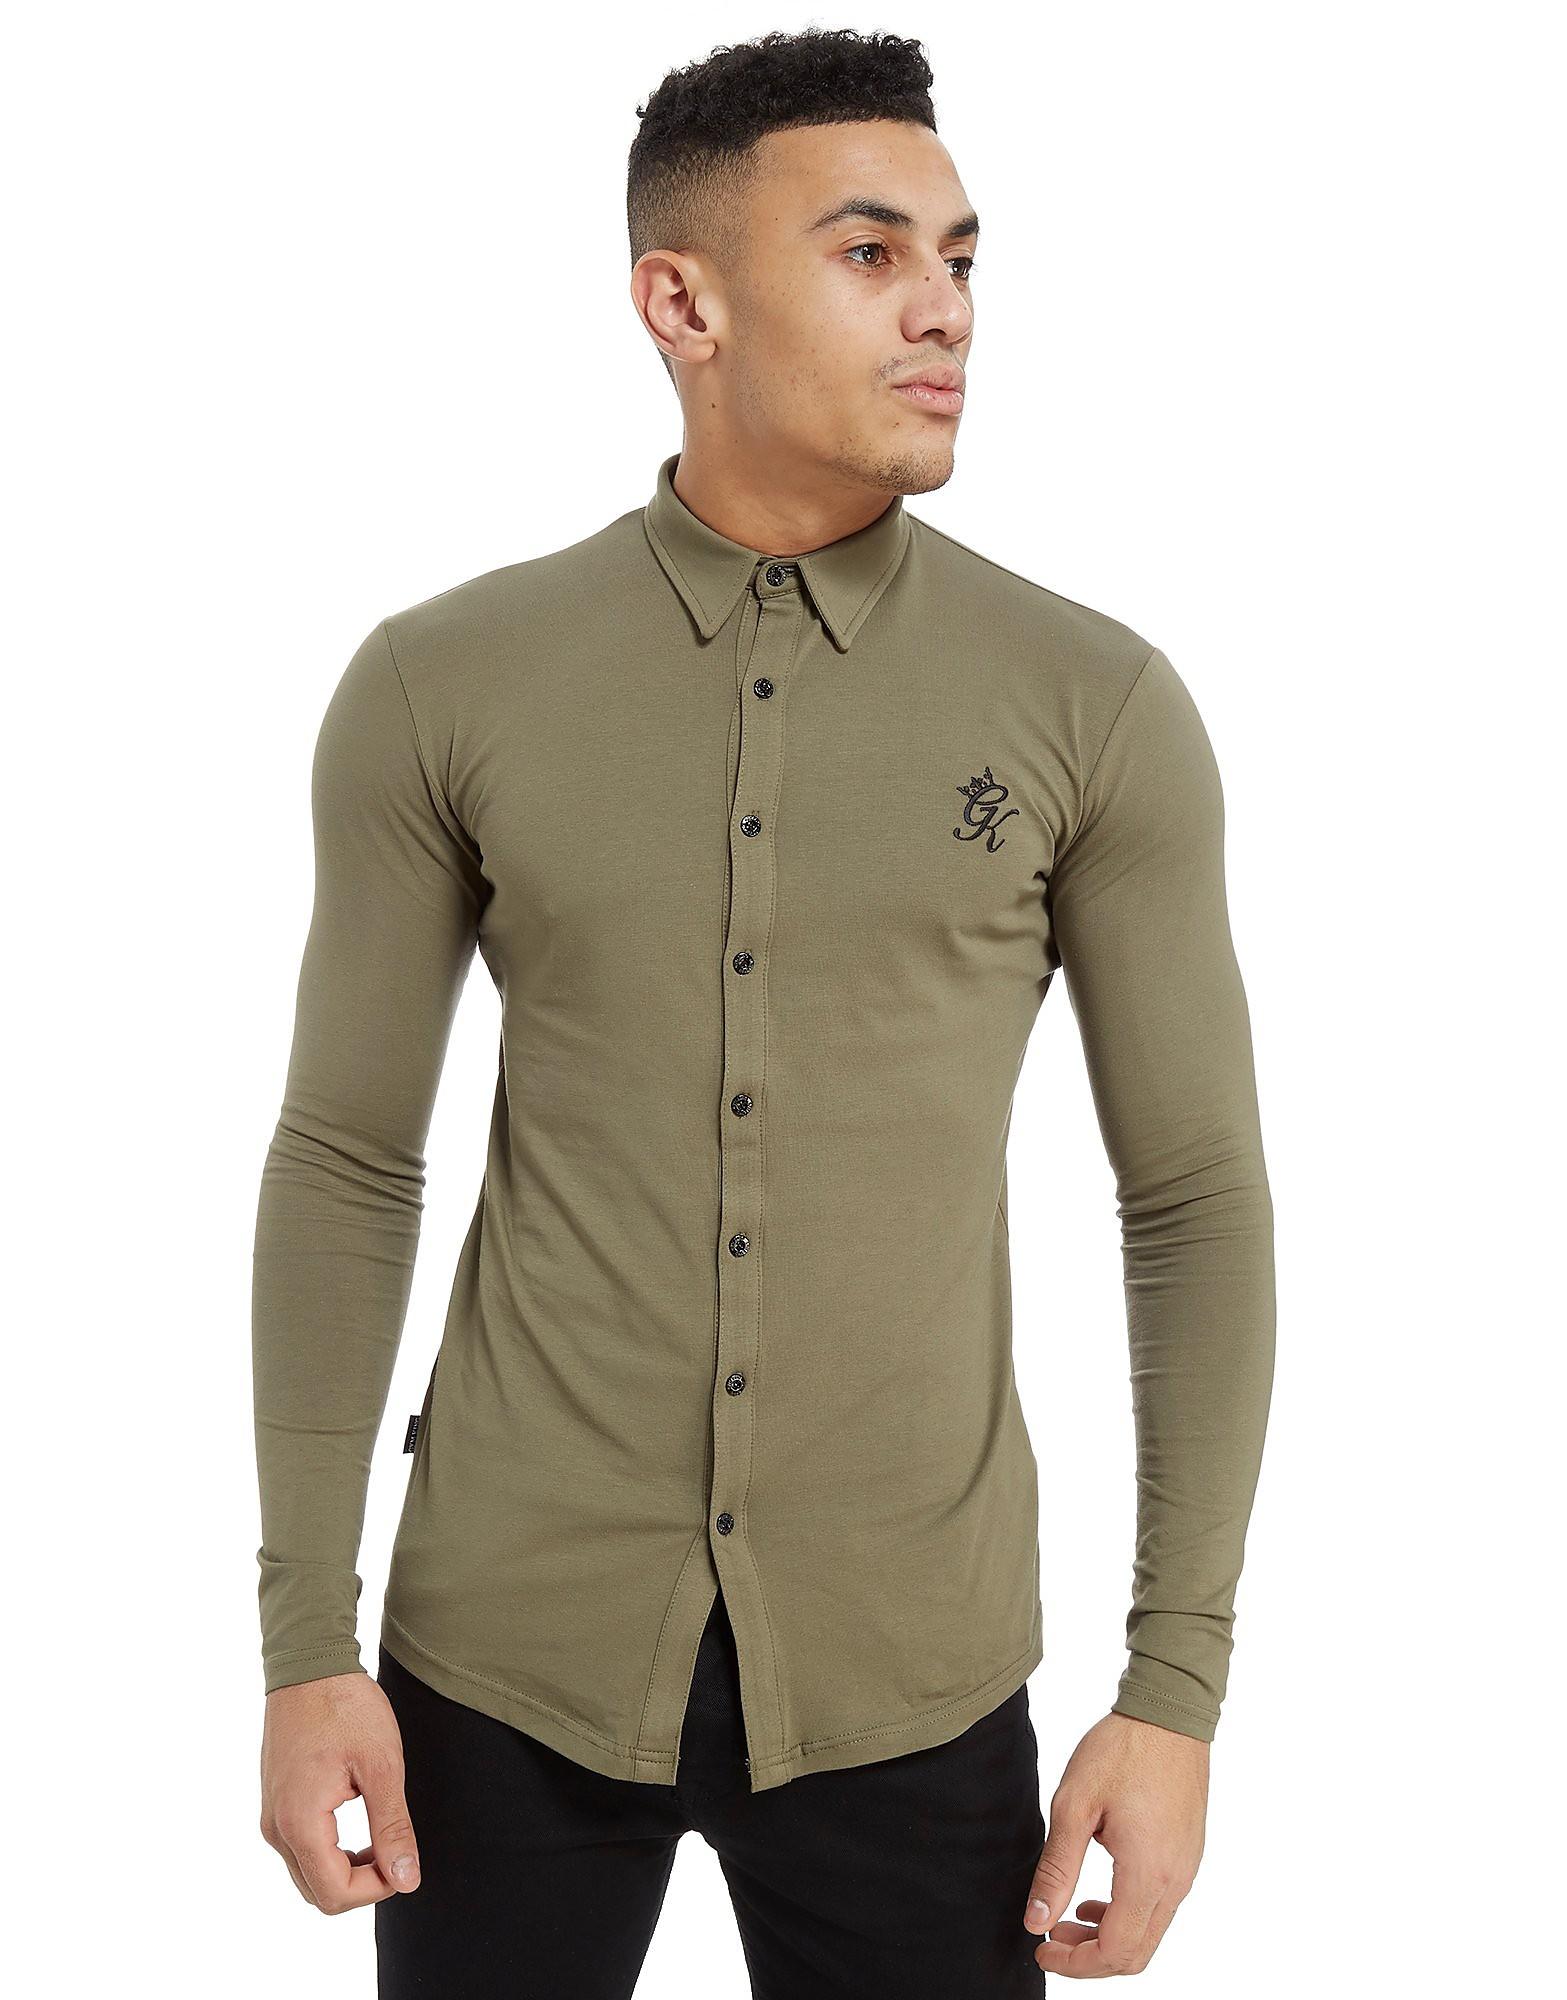 Gym King Core Long Sleeve Shirt